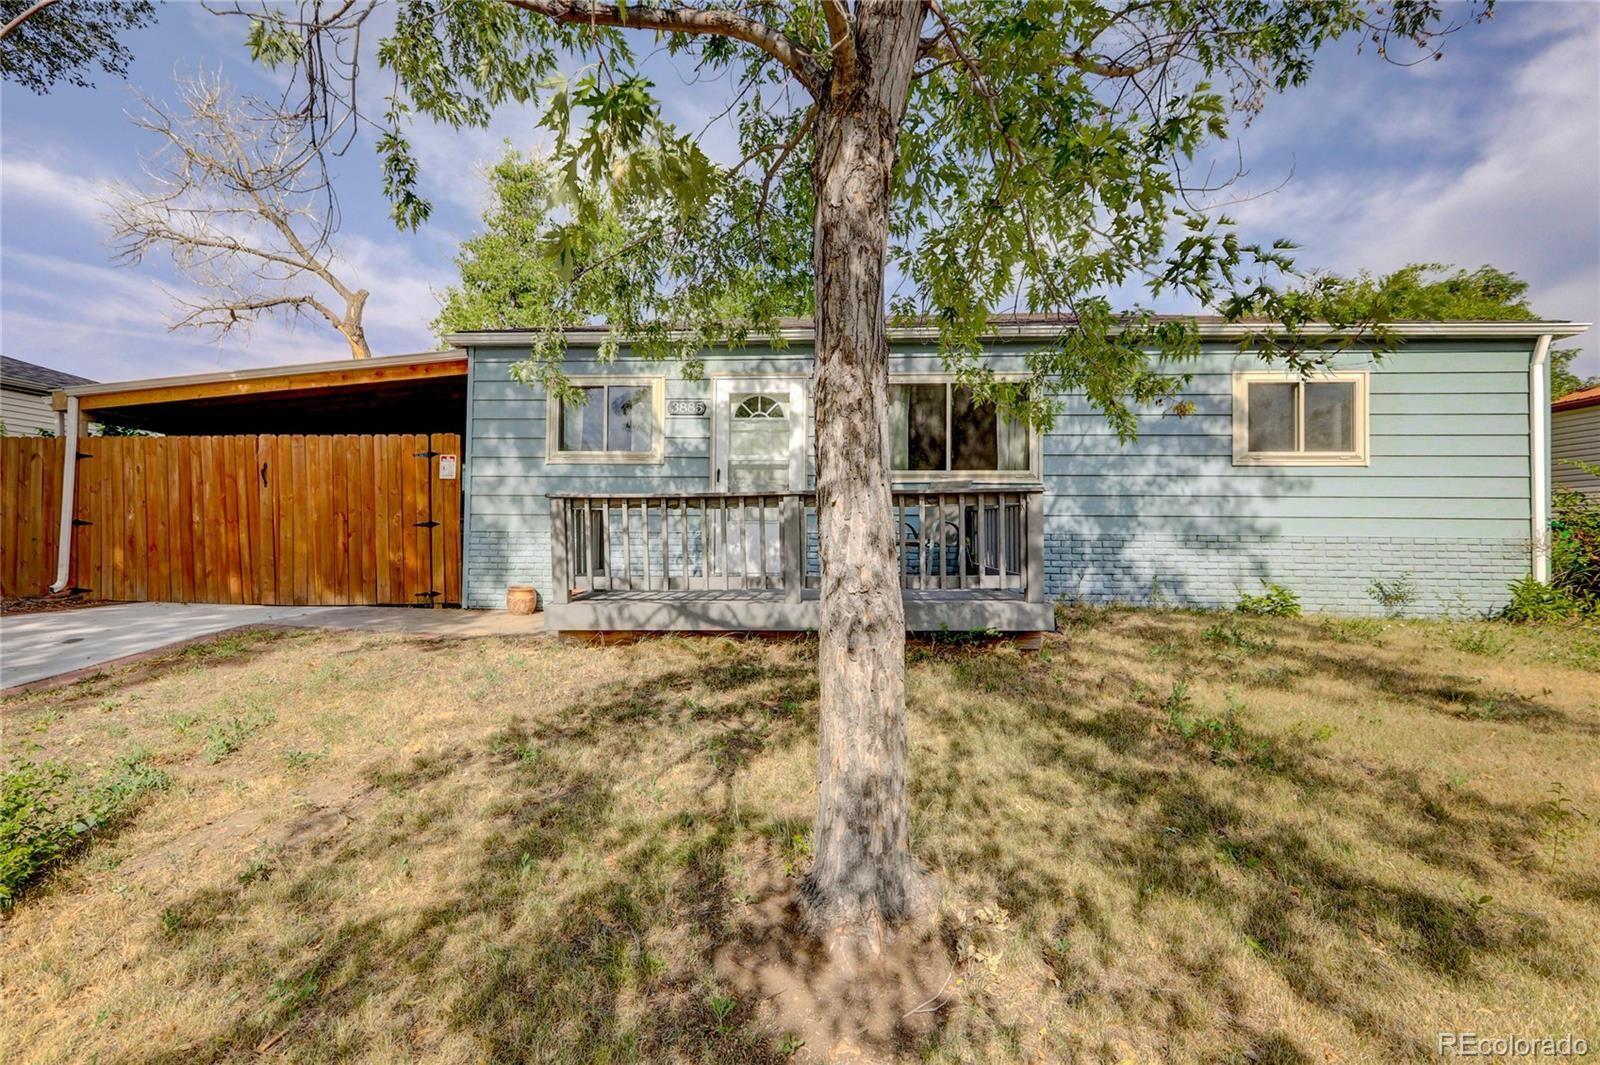 3885 Miller Court, Wheat Ridge, CO 80033 - #: 6701413